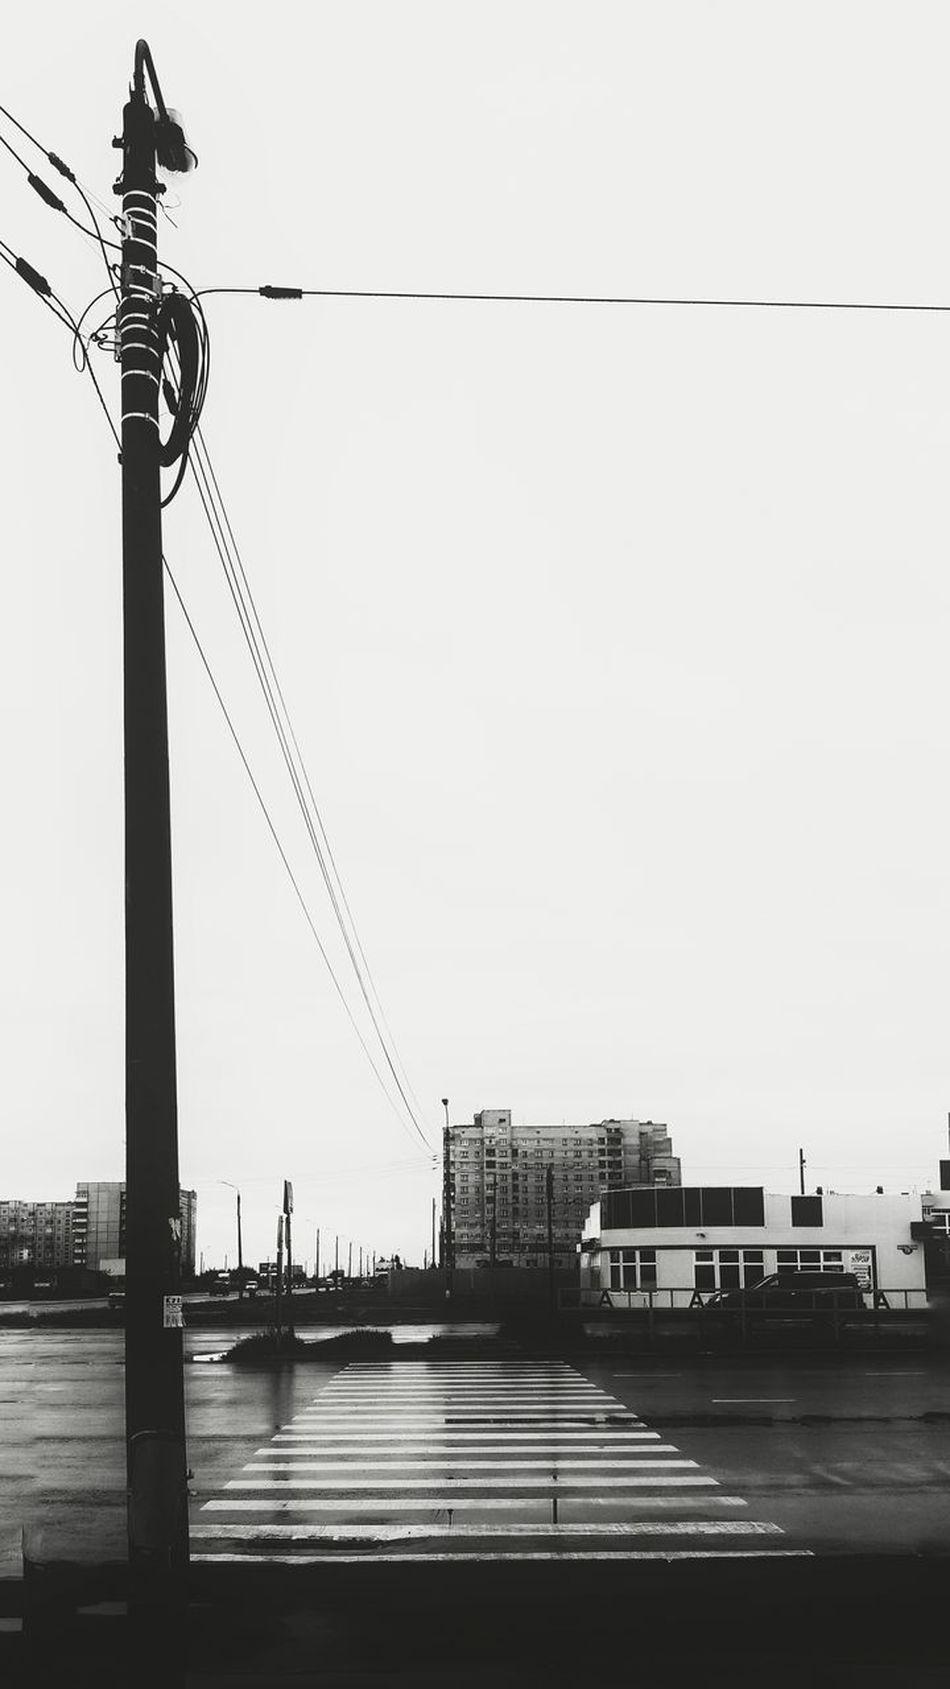 Hello World Relaxing Enjoying Life Streetphotography Severodvinsk небо My Monochrome World уличная фотография Чб нуар